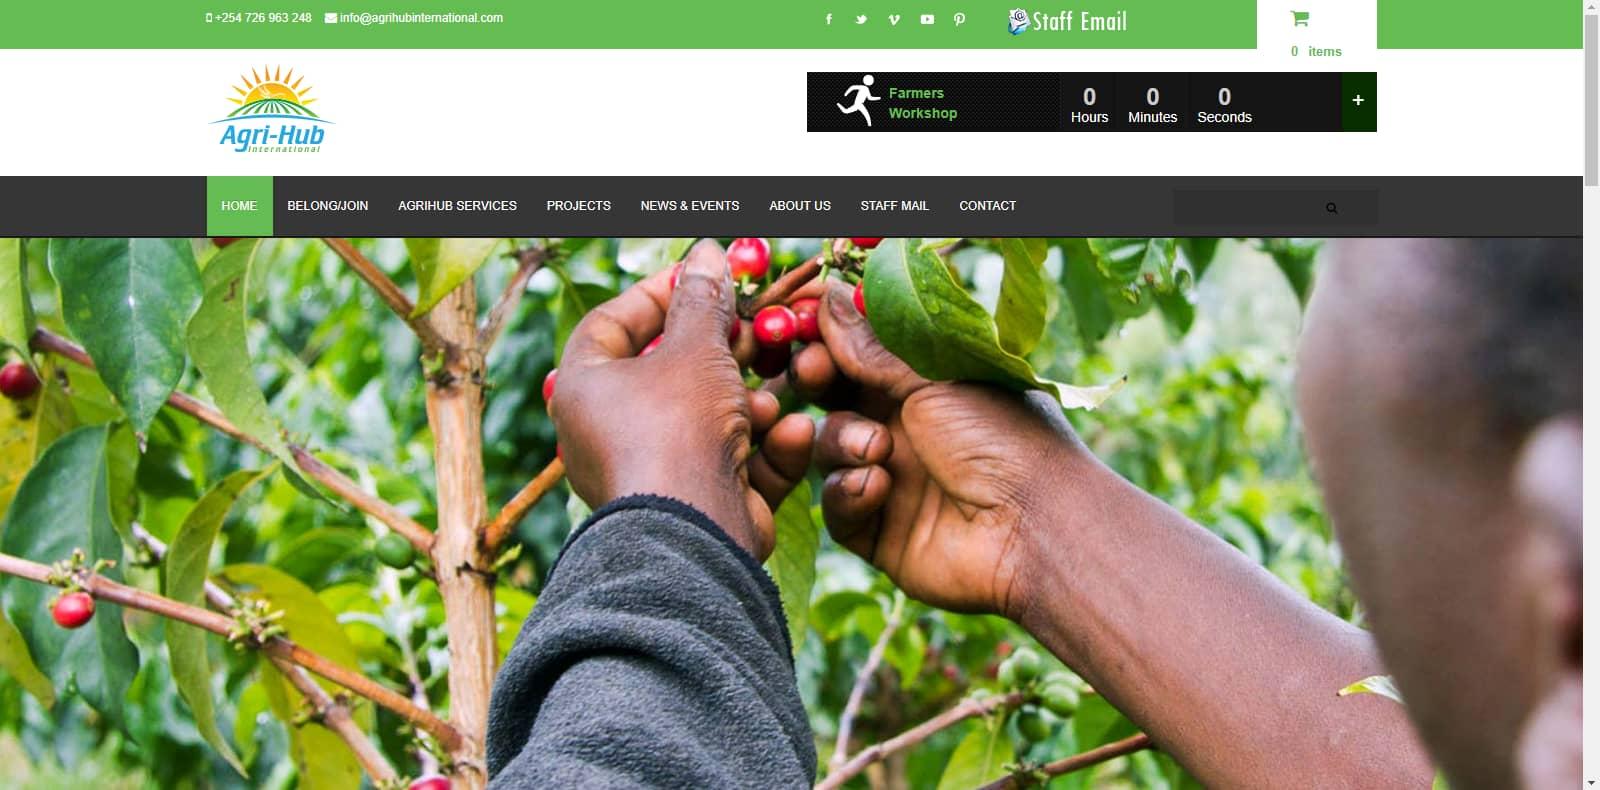 Website Design Project - Agri-Hub International